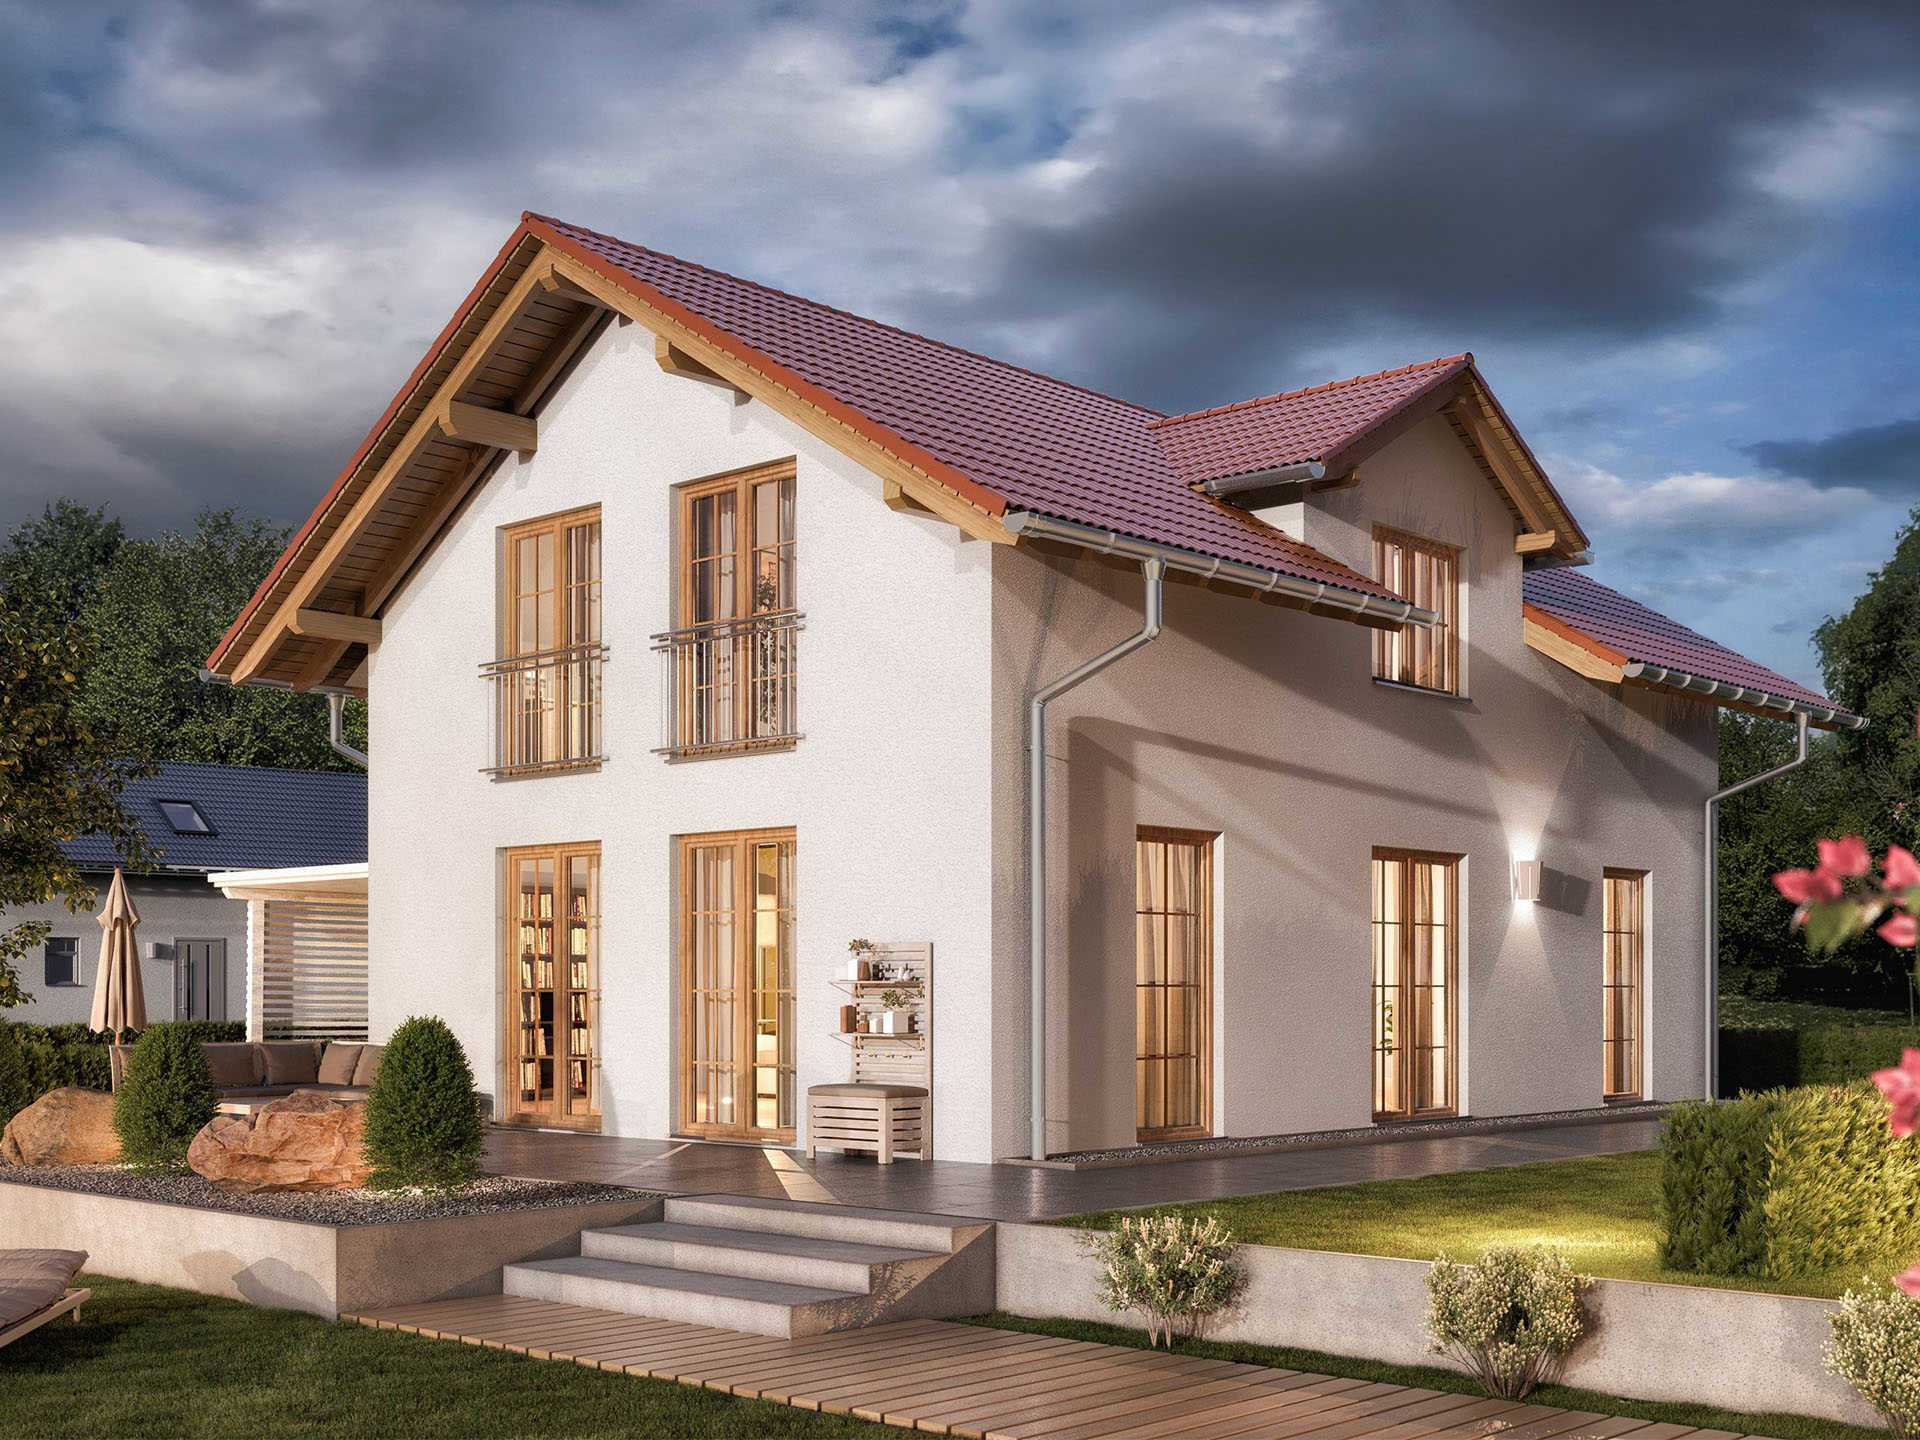 Engellandt Hausbau - Town & Country Bodensee 129 Trend